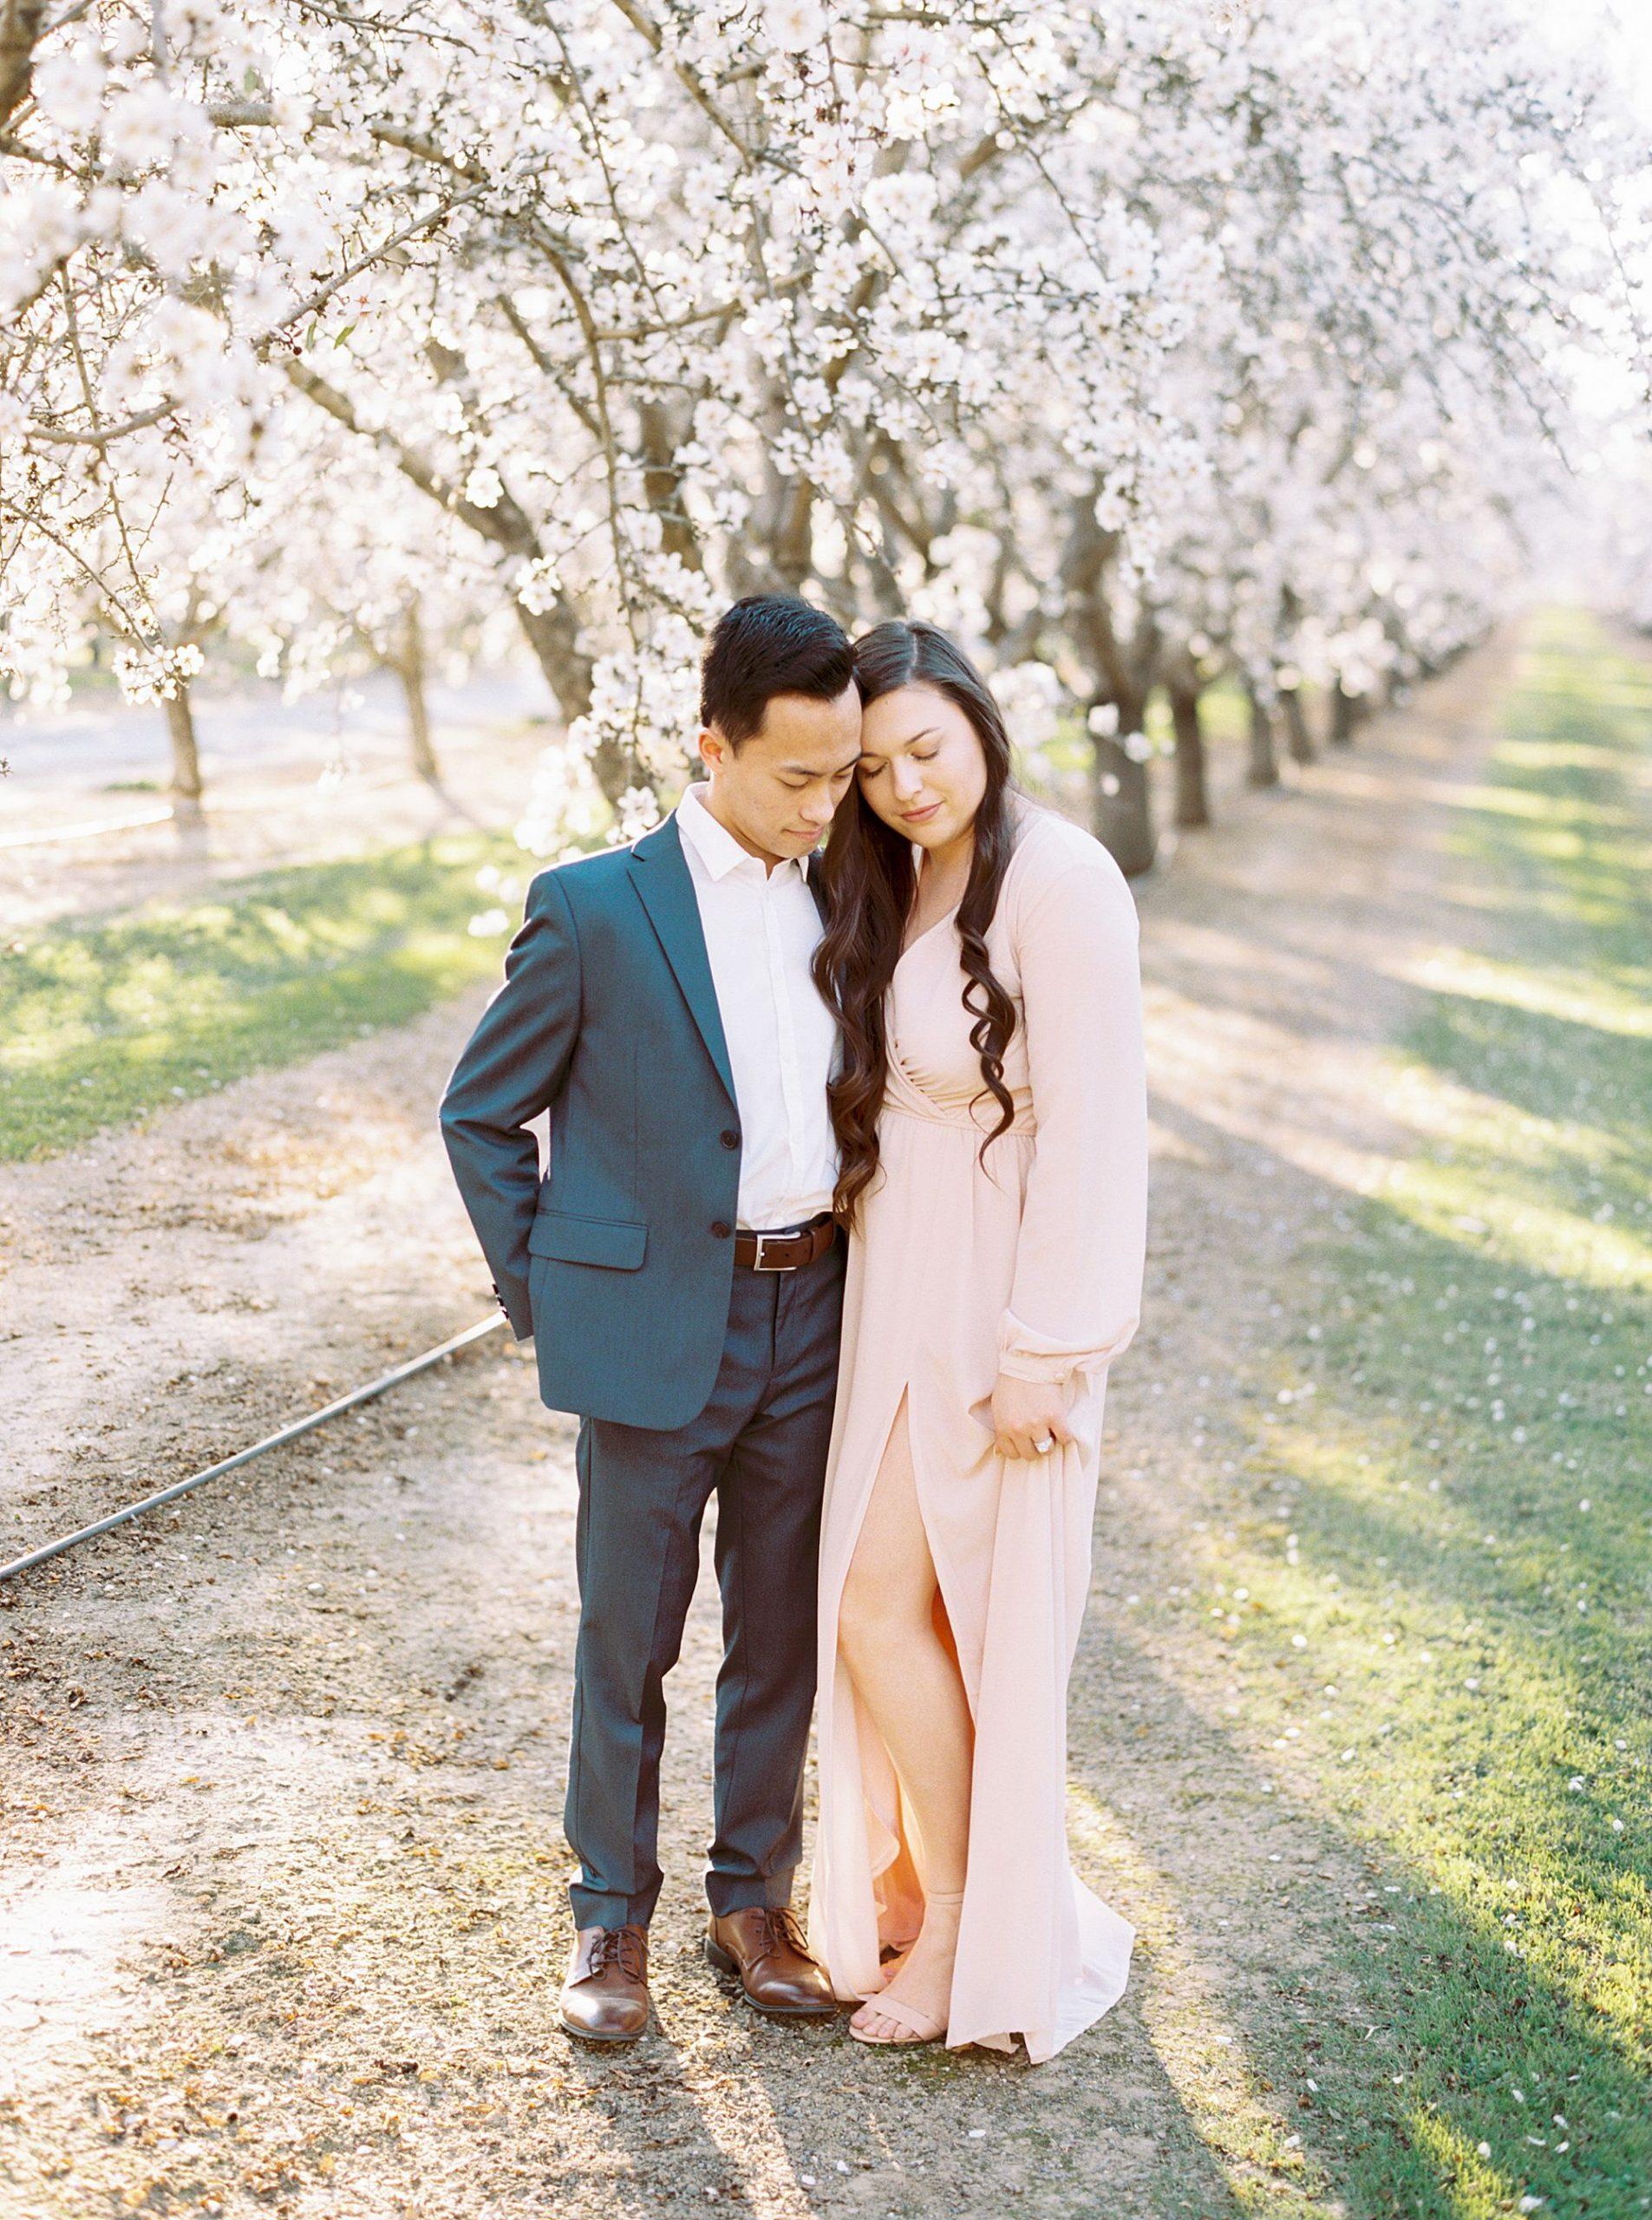 Almond Orchard Engagement Session - Caley and Tyler - Lone Oak Wedding - Ashley Baumgartner - Almond Blossom_0004.jpg